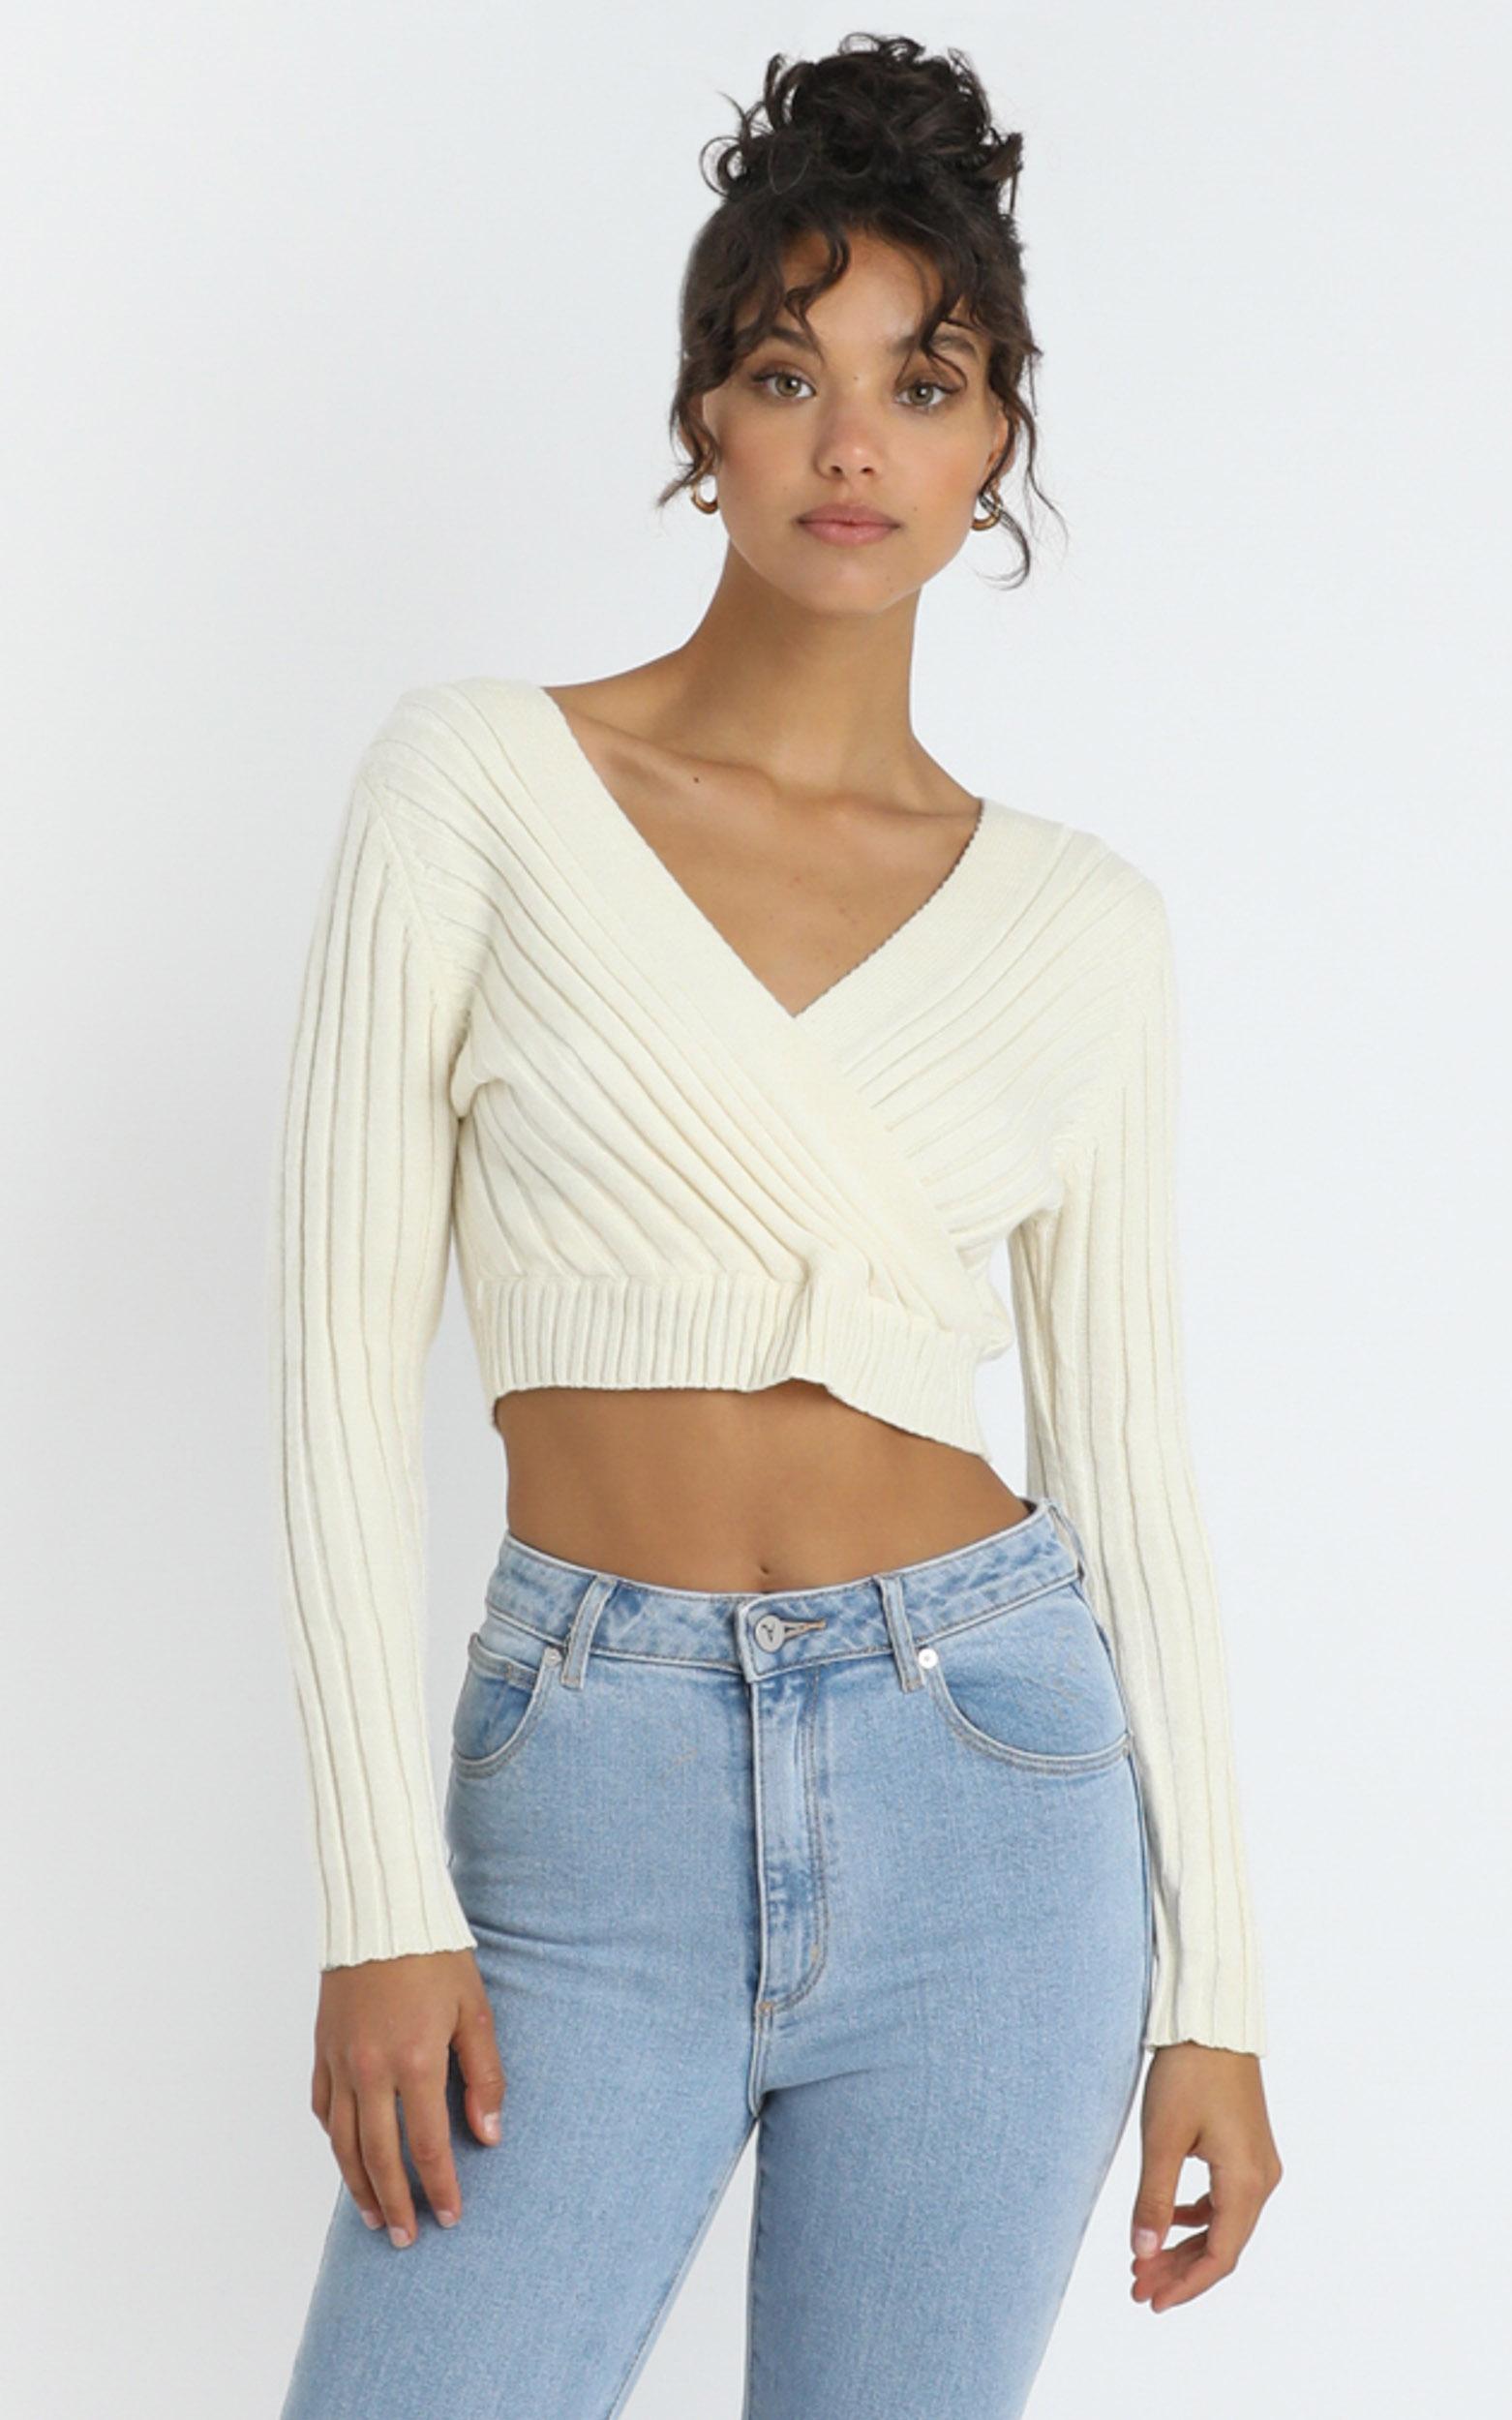 Zina Knit Top in Cream - 8 (S), Cream, hi-res image number null